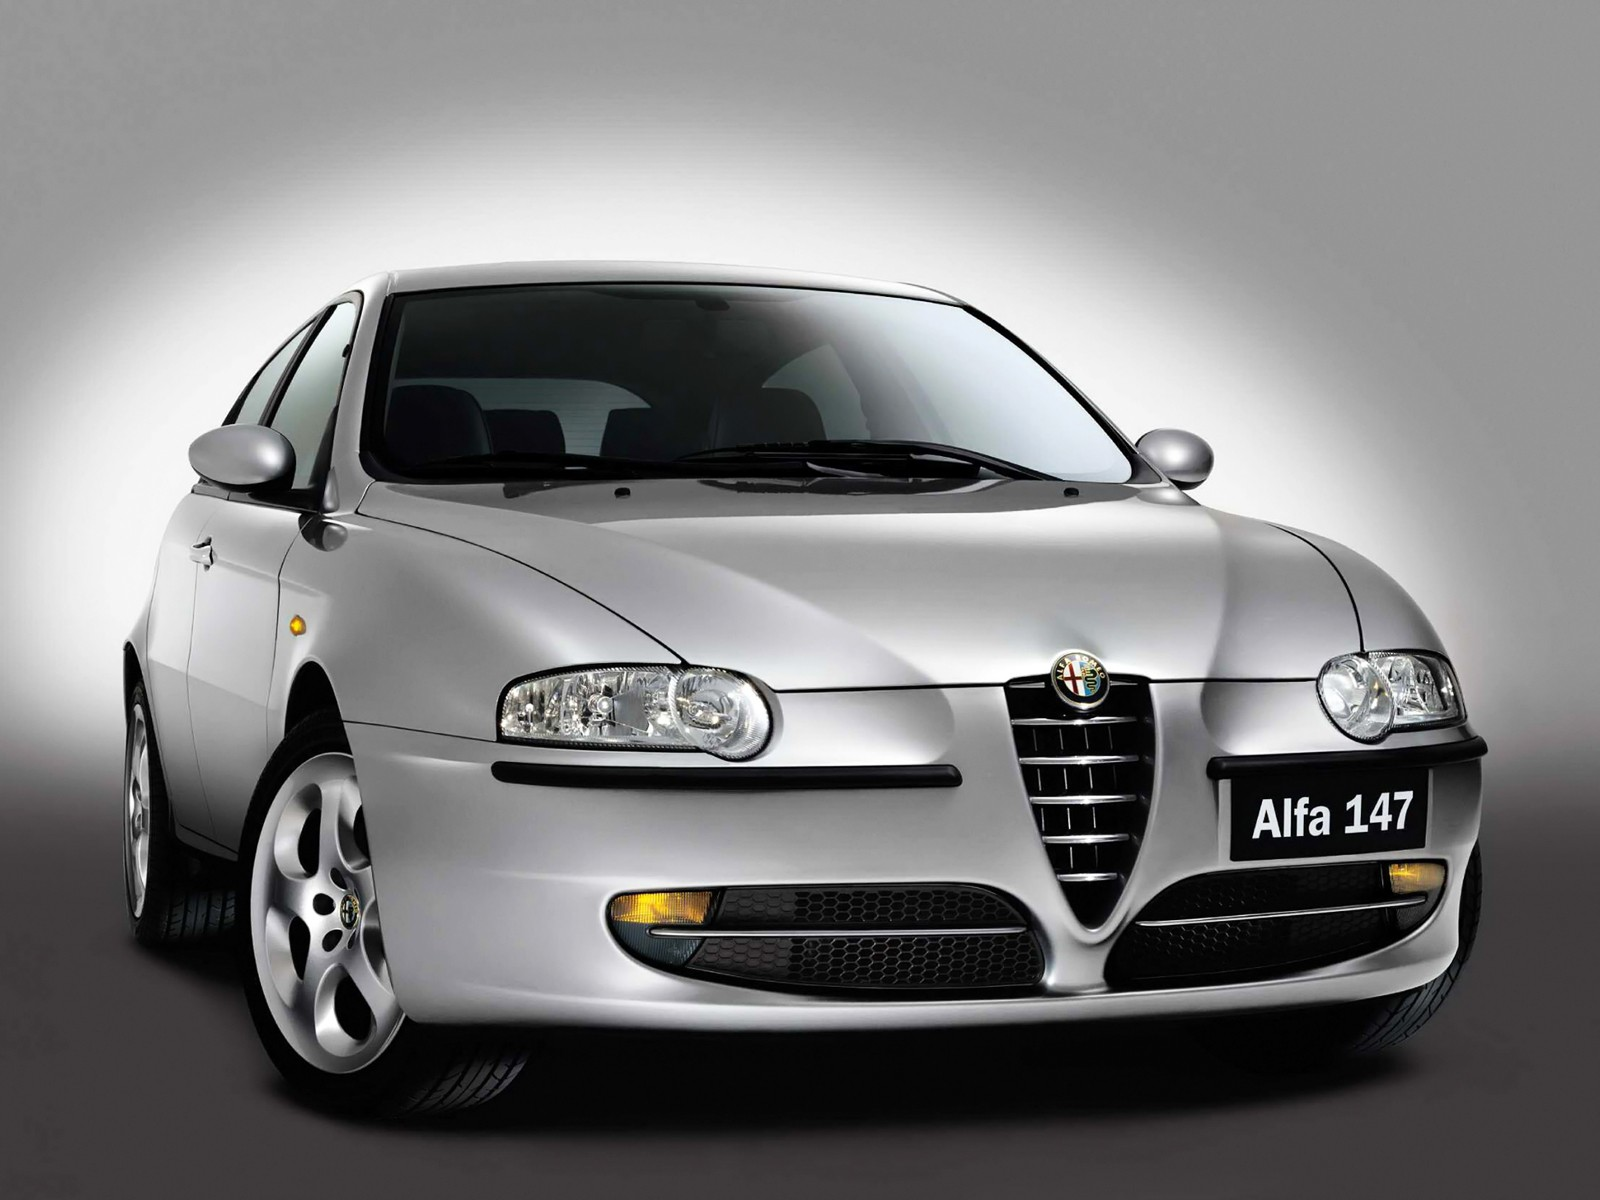 alfa romeo 147 5 doors 2000 2001 2002 2003 2004 2005 autoevolution. Black Bedroom Furniture Sets. Home Design Ideas